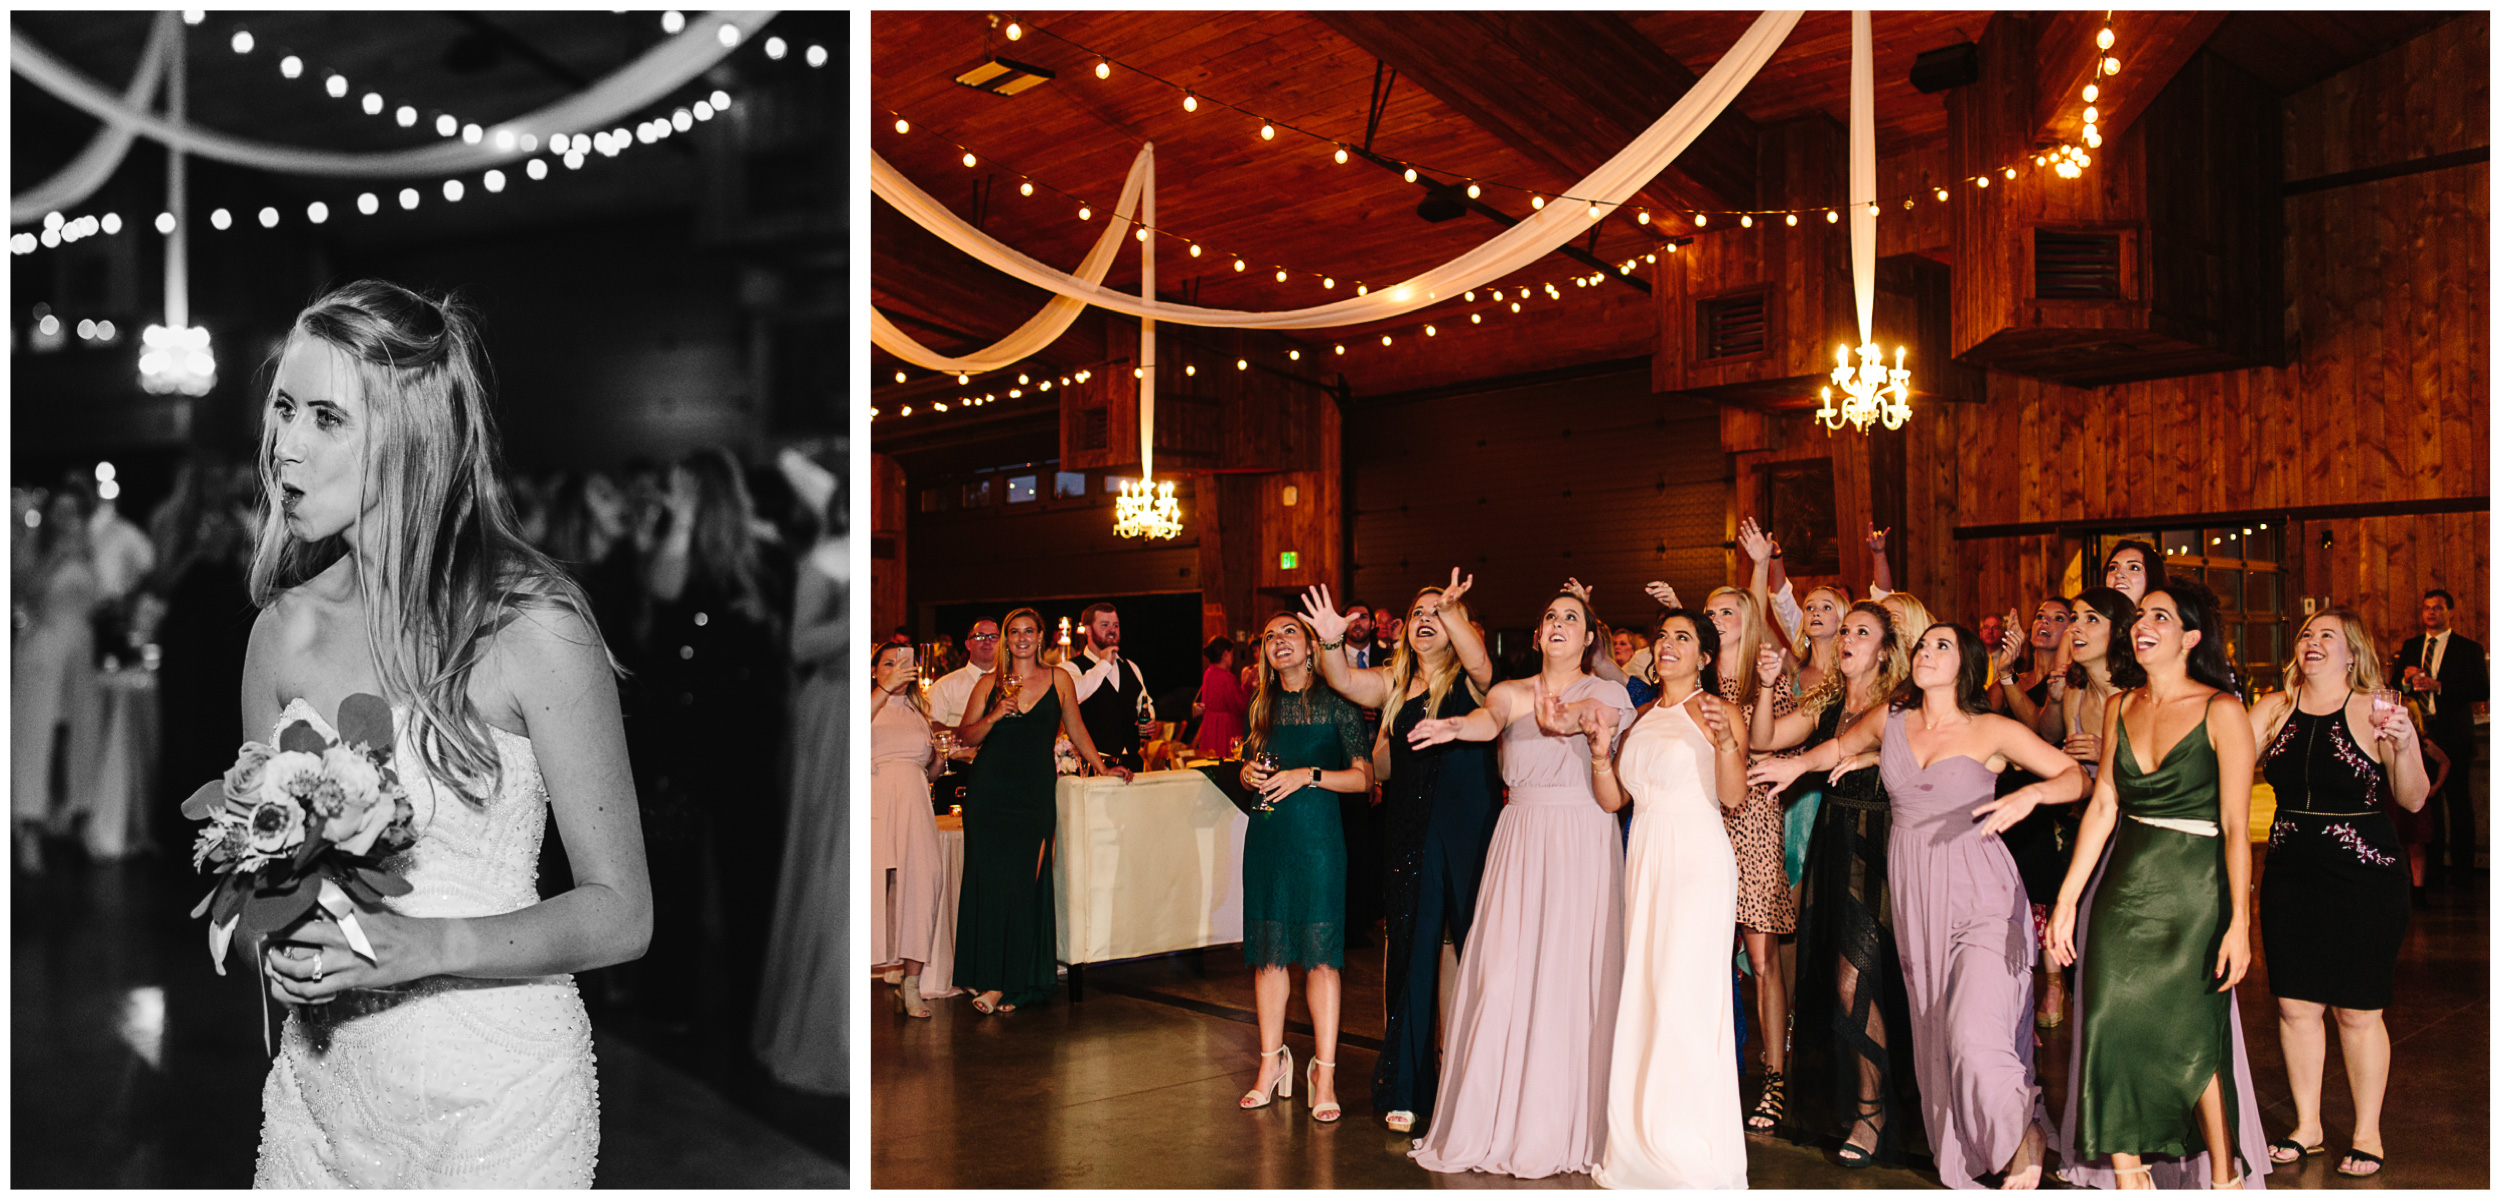 spruce_mountain_ranch_wedding_93.jpg